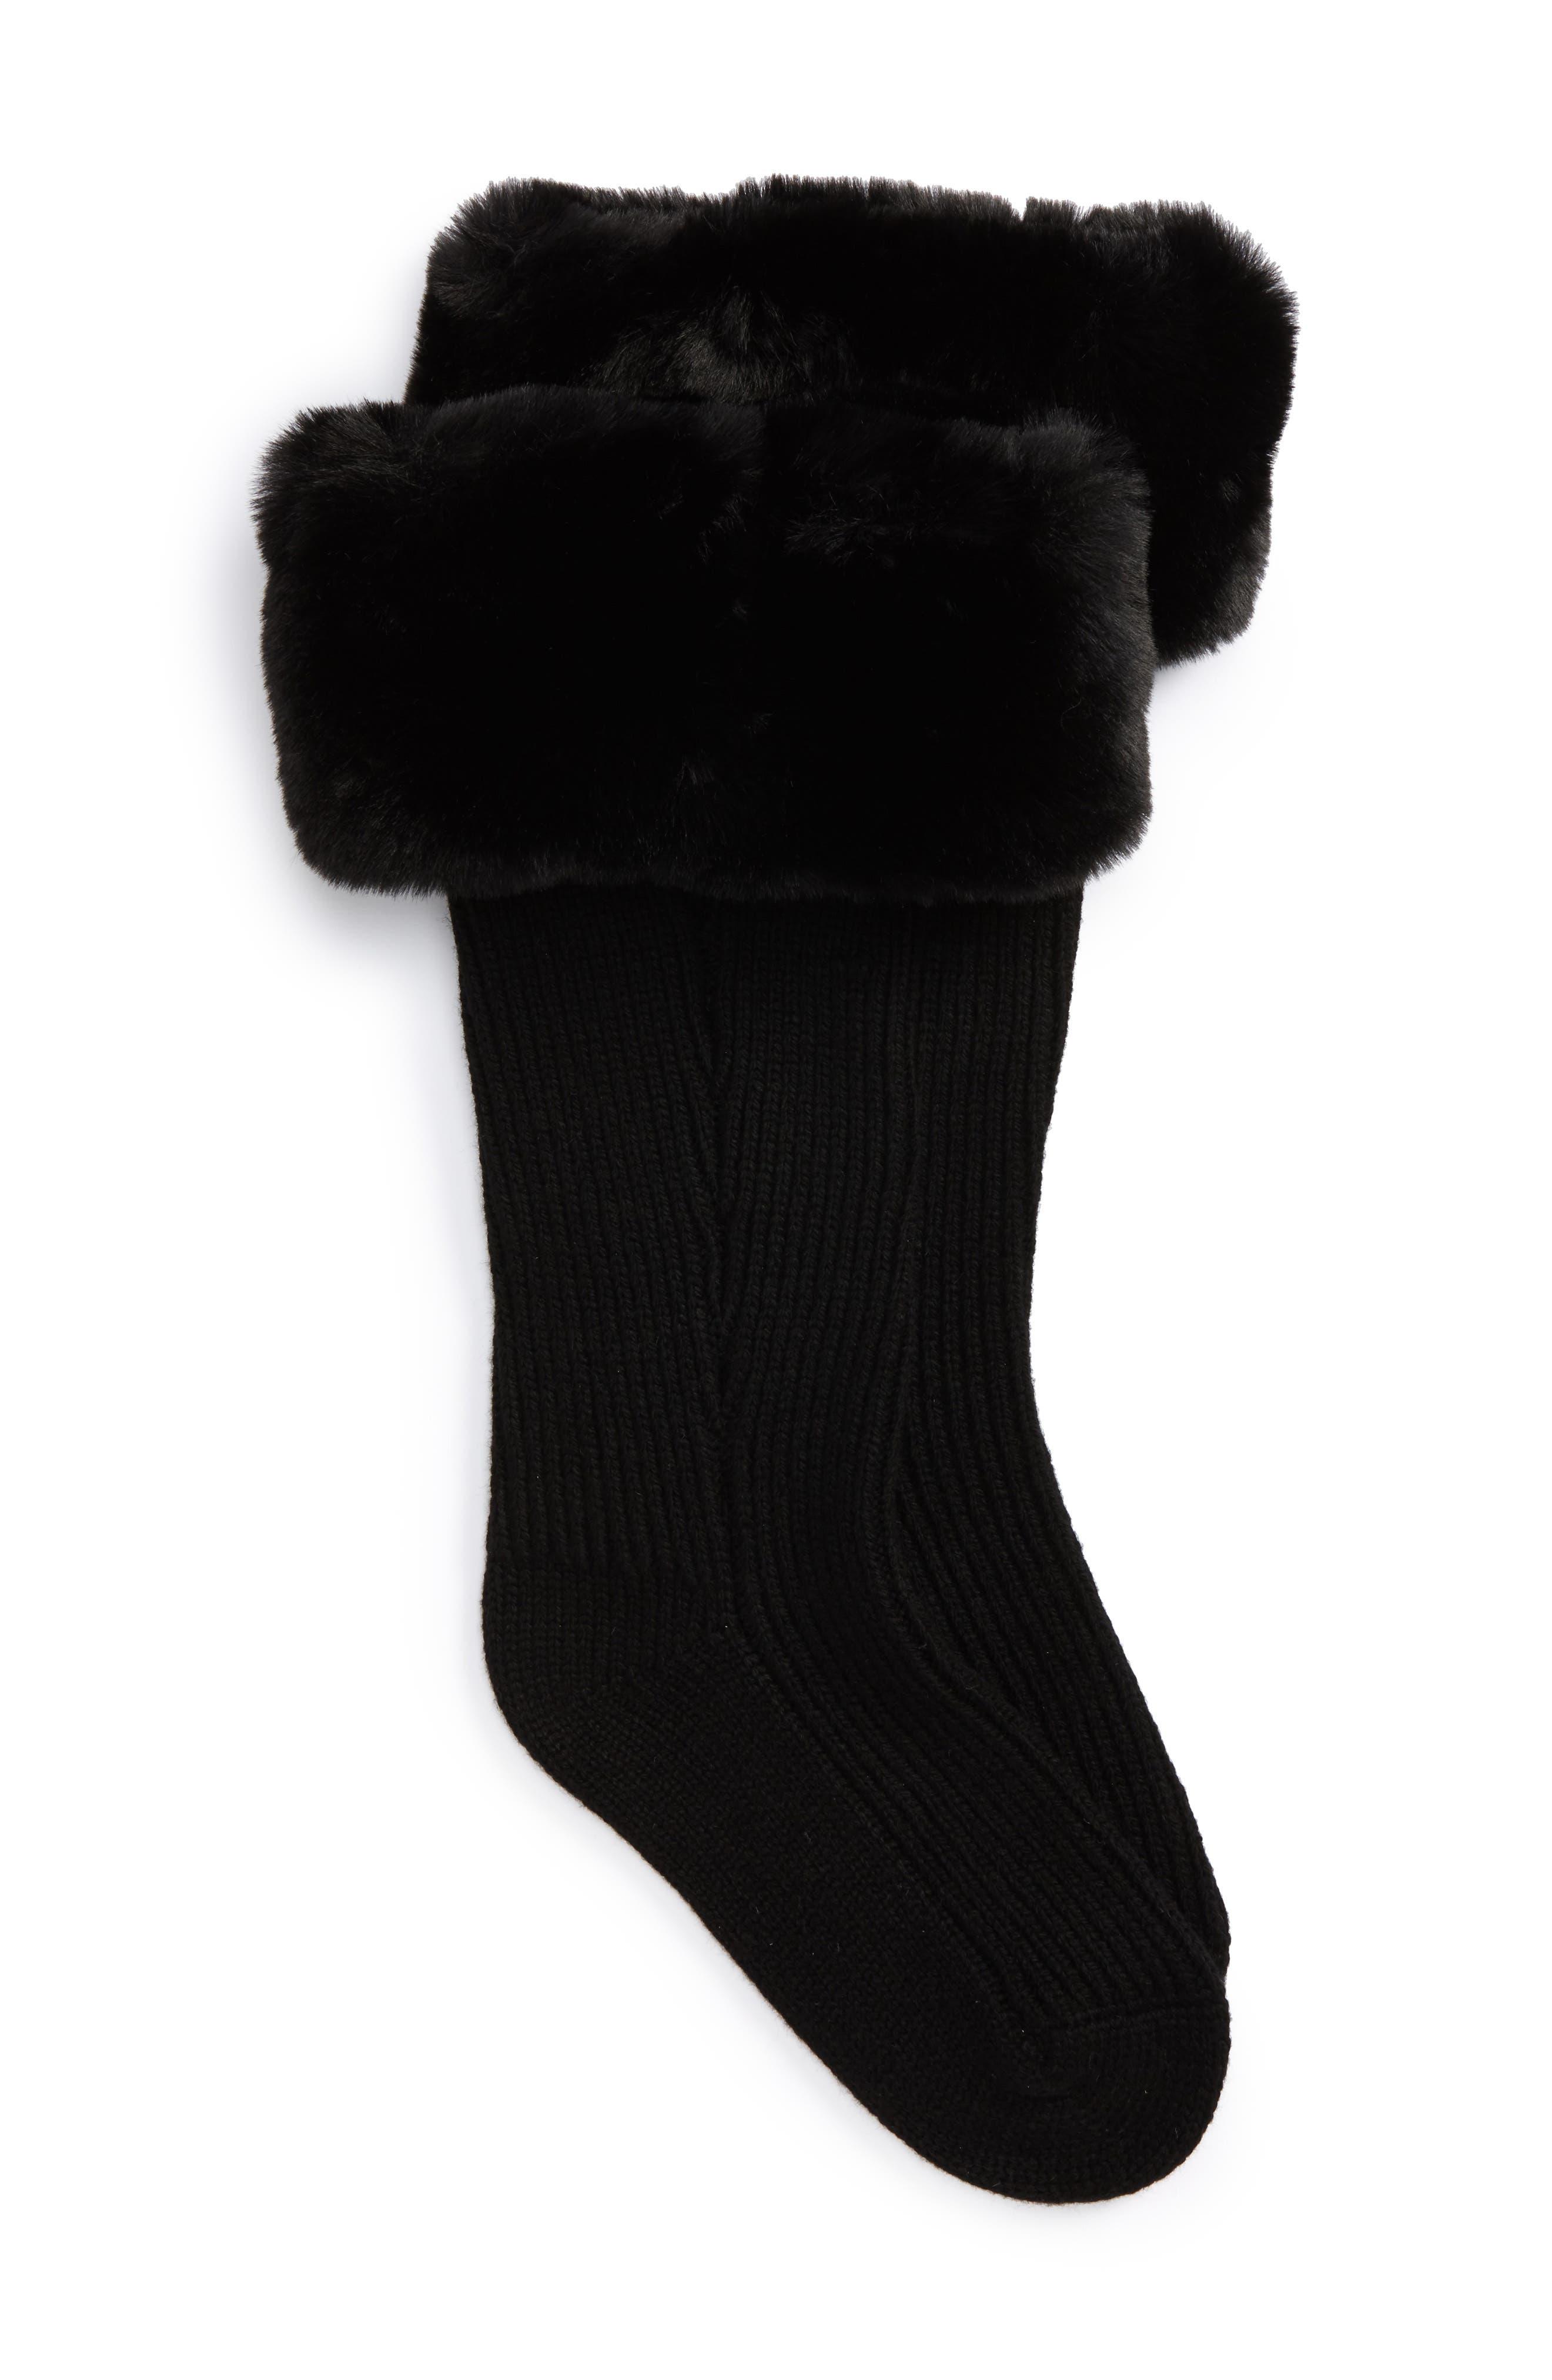 UGGpure<sup>™</sup> Tall Rain Boot Sock,                         Main,                         color, BLACK WOOL